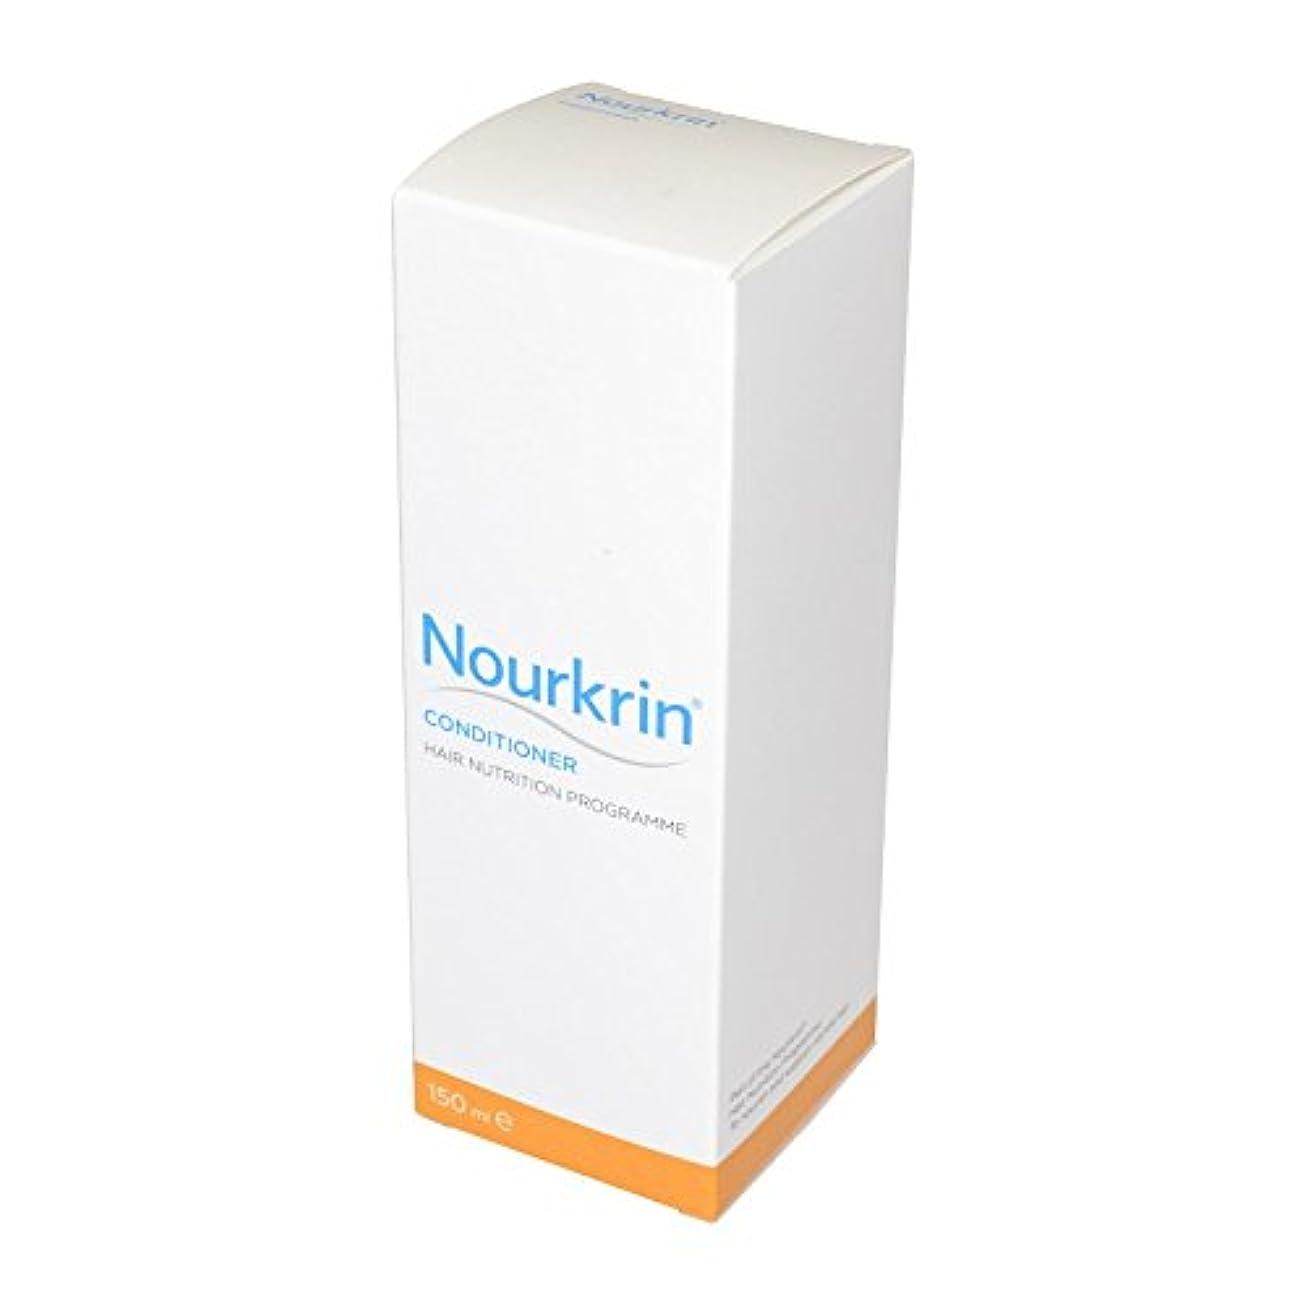 Nourkrin Conditioner (Pack of 2) - Nourkrinコンディショナー (x2) [並行輸入品]